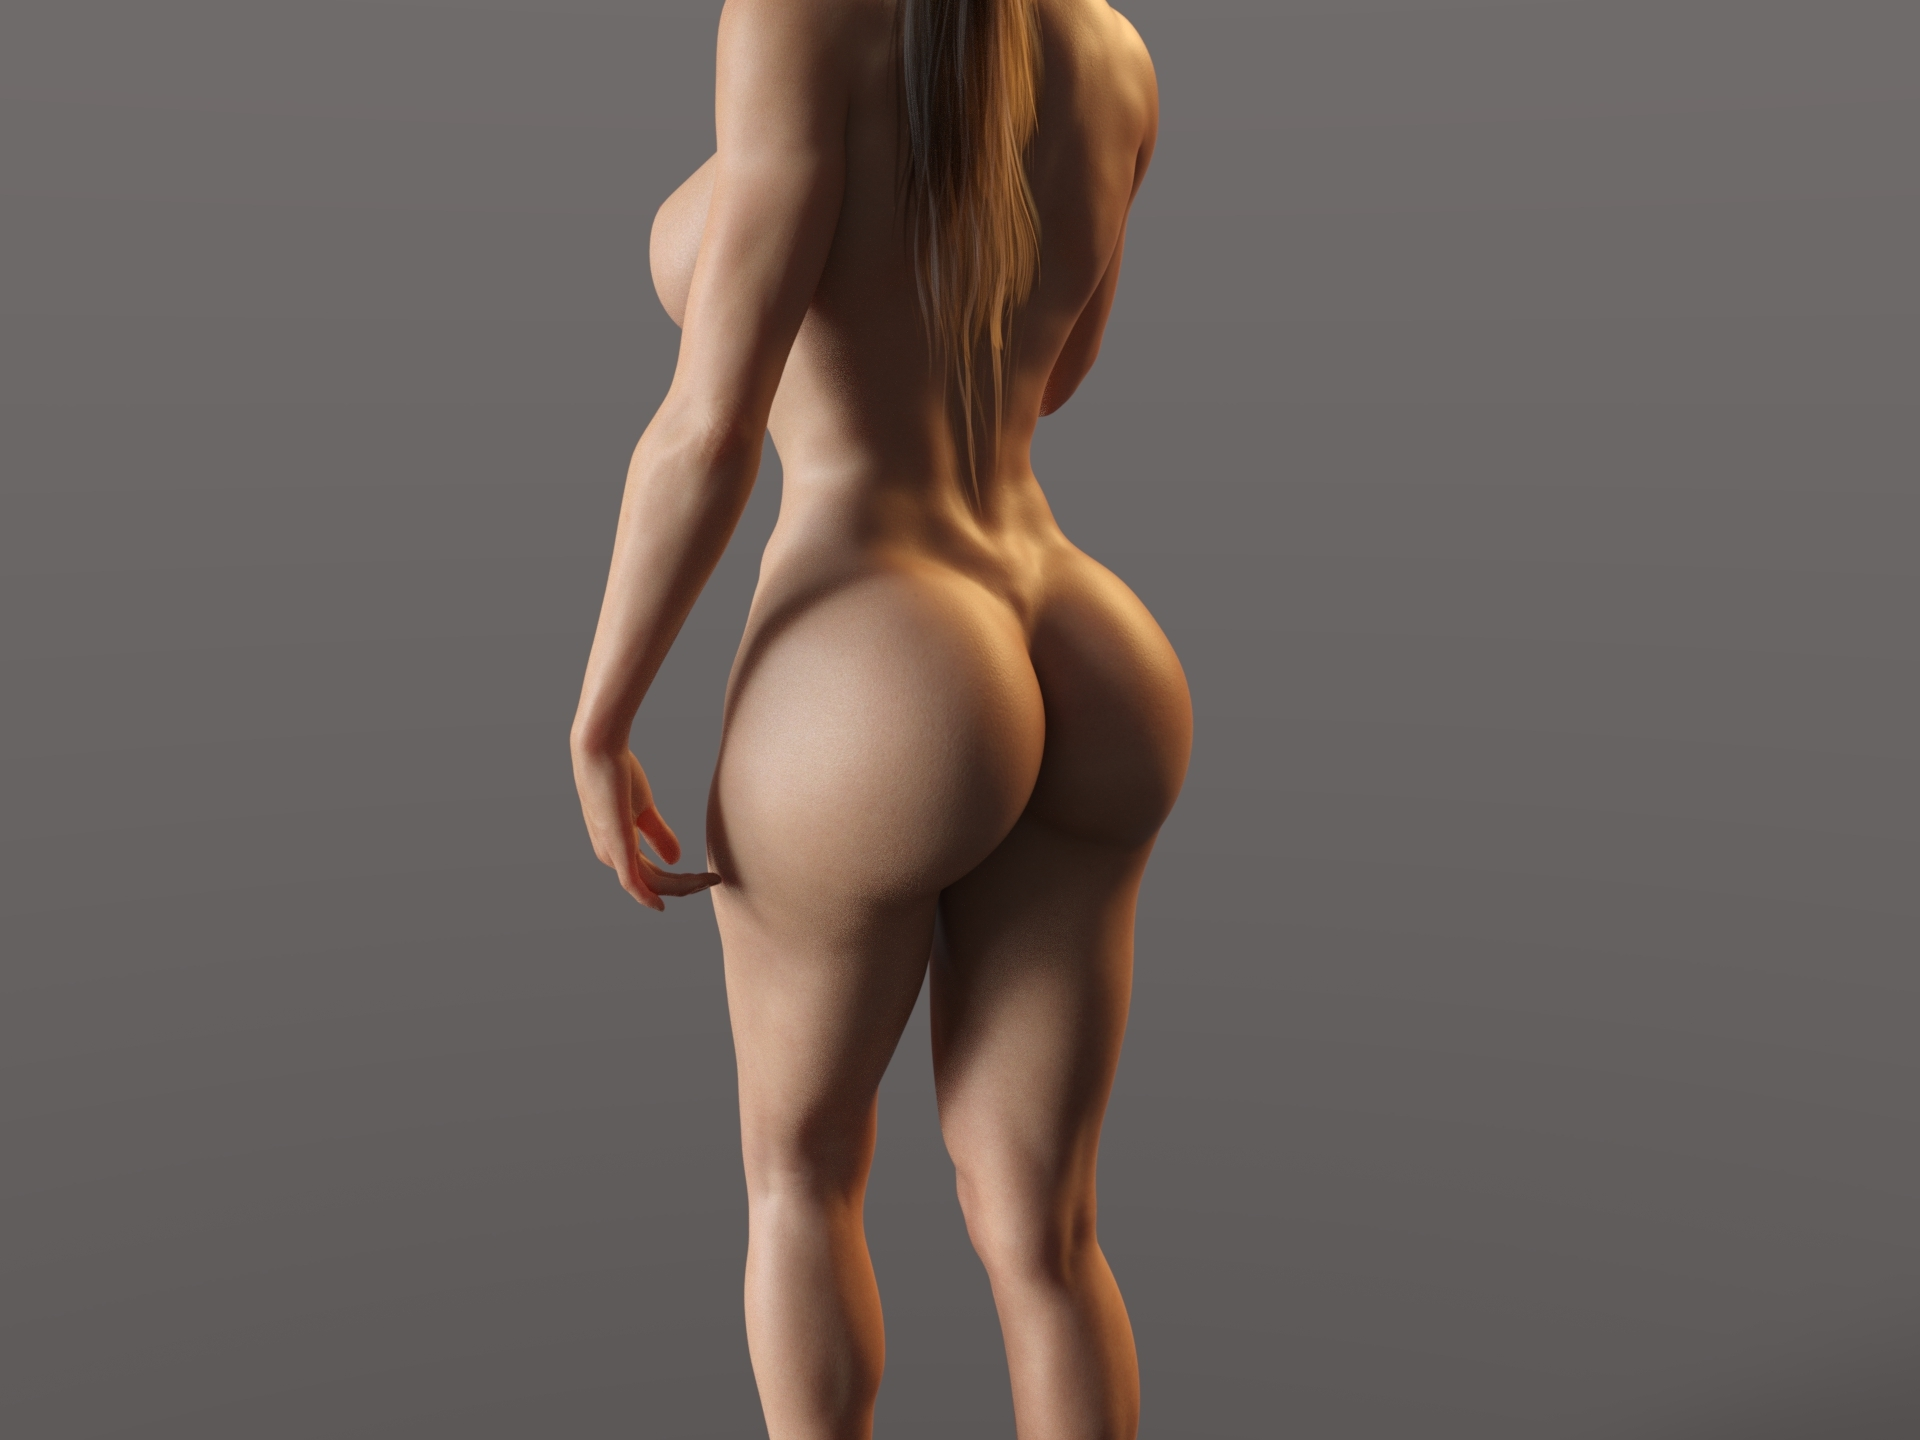 Lara Croft pinups by SickCycle